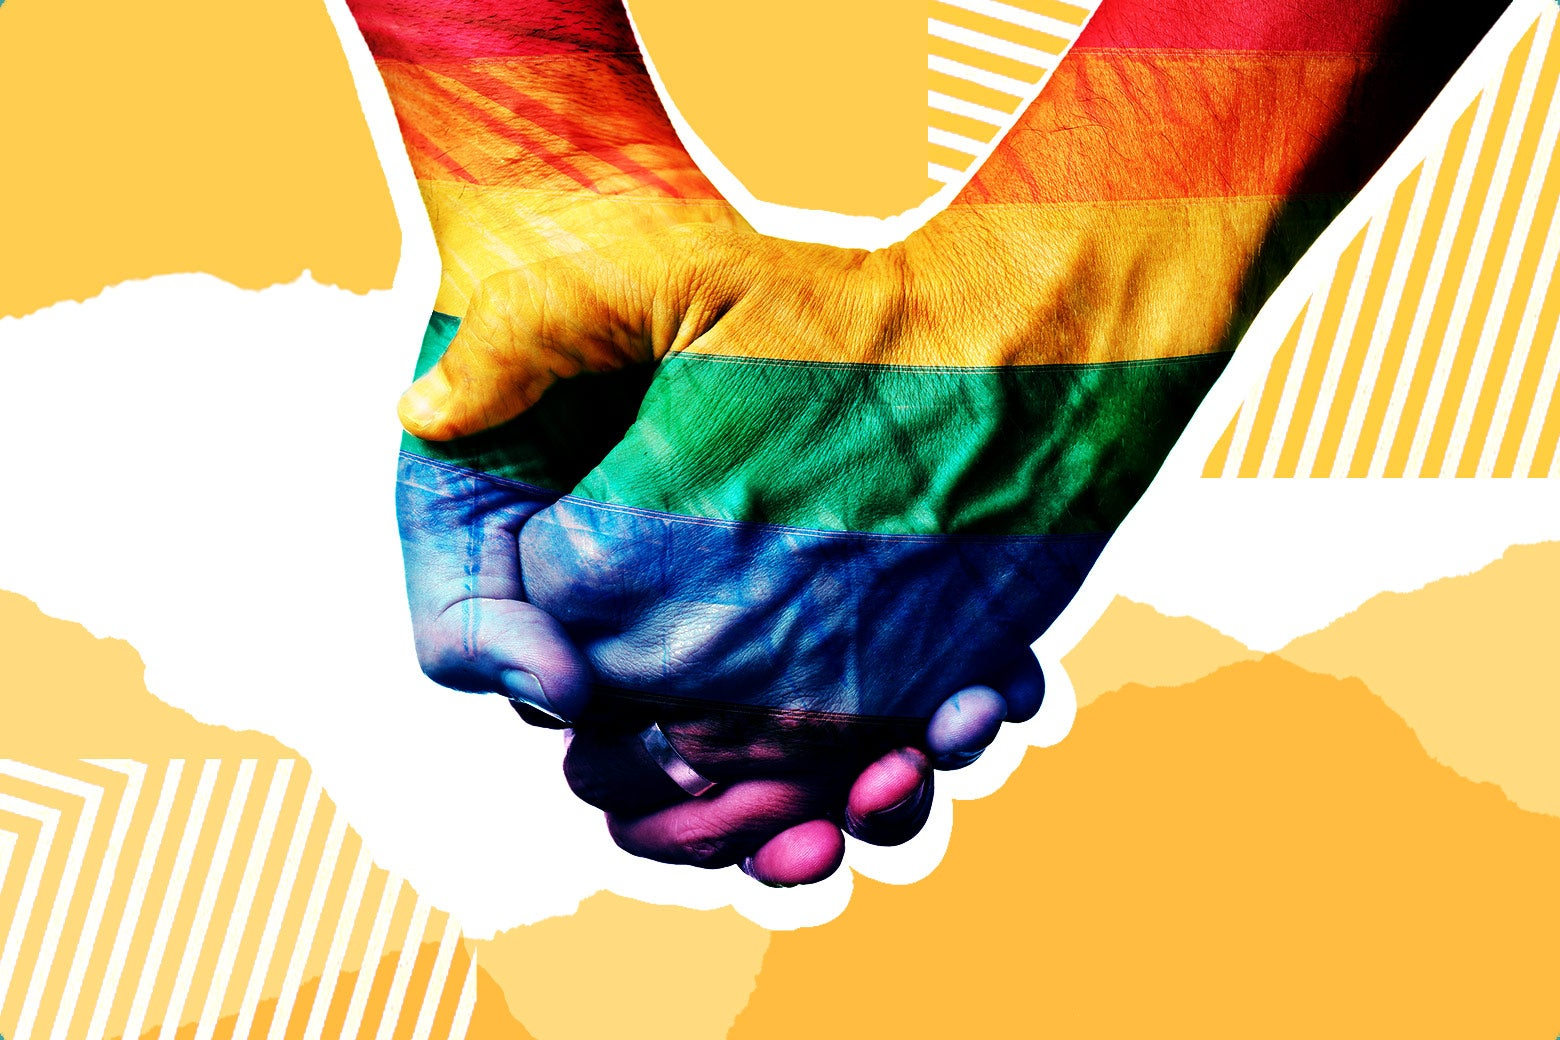 LGBQT holding hands.